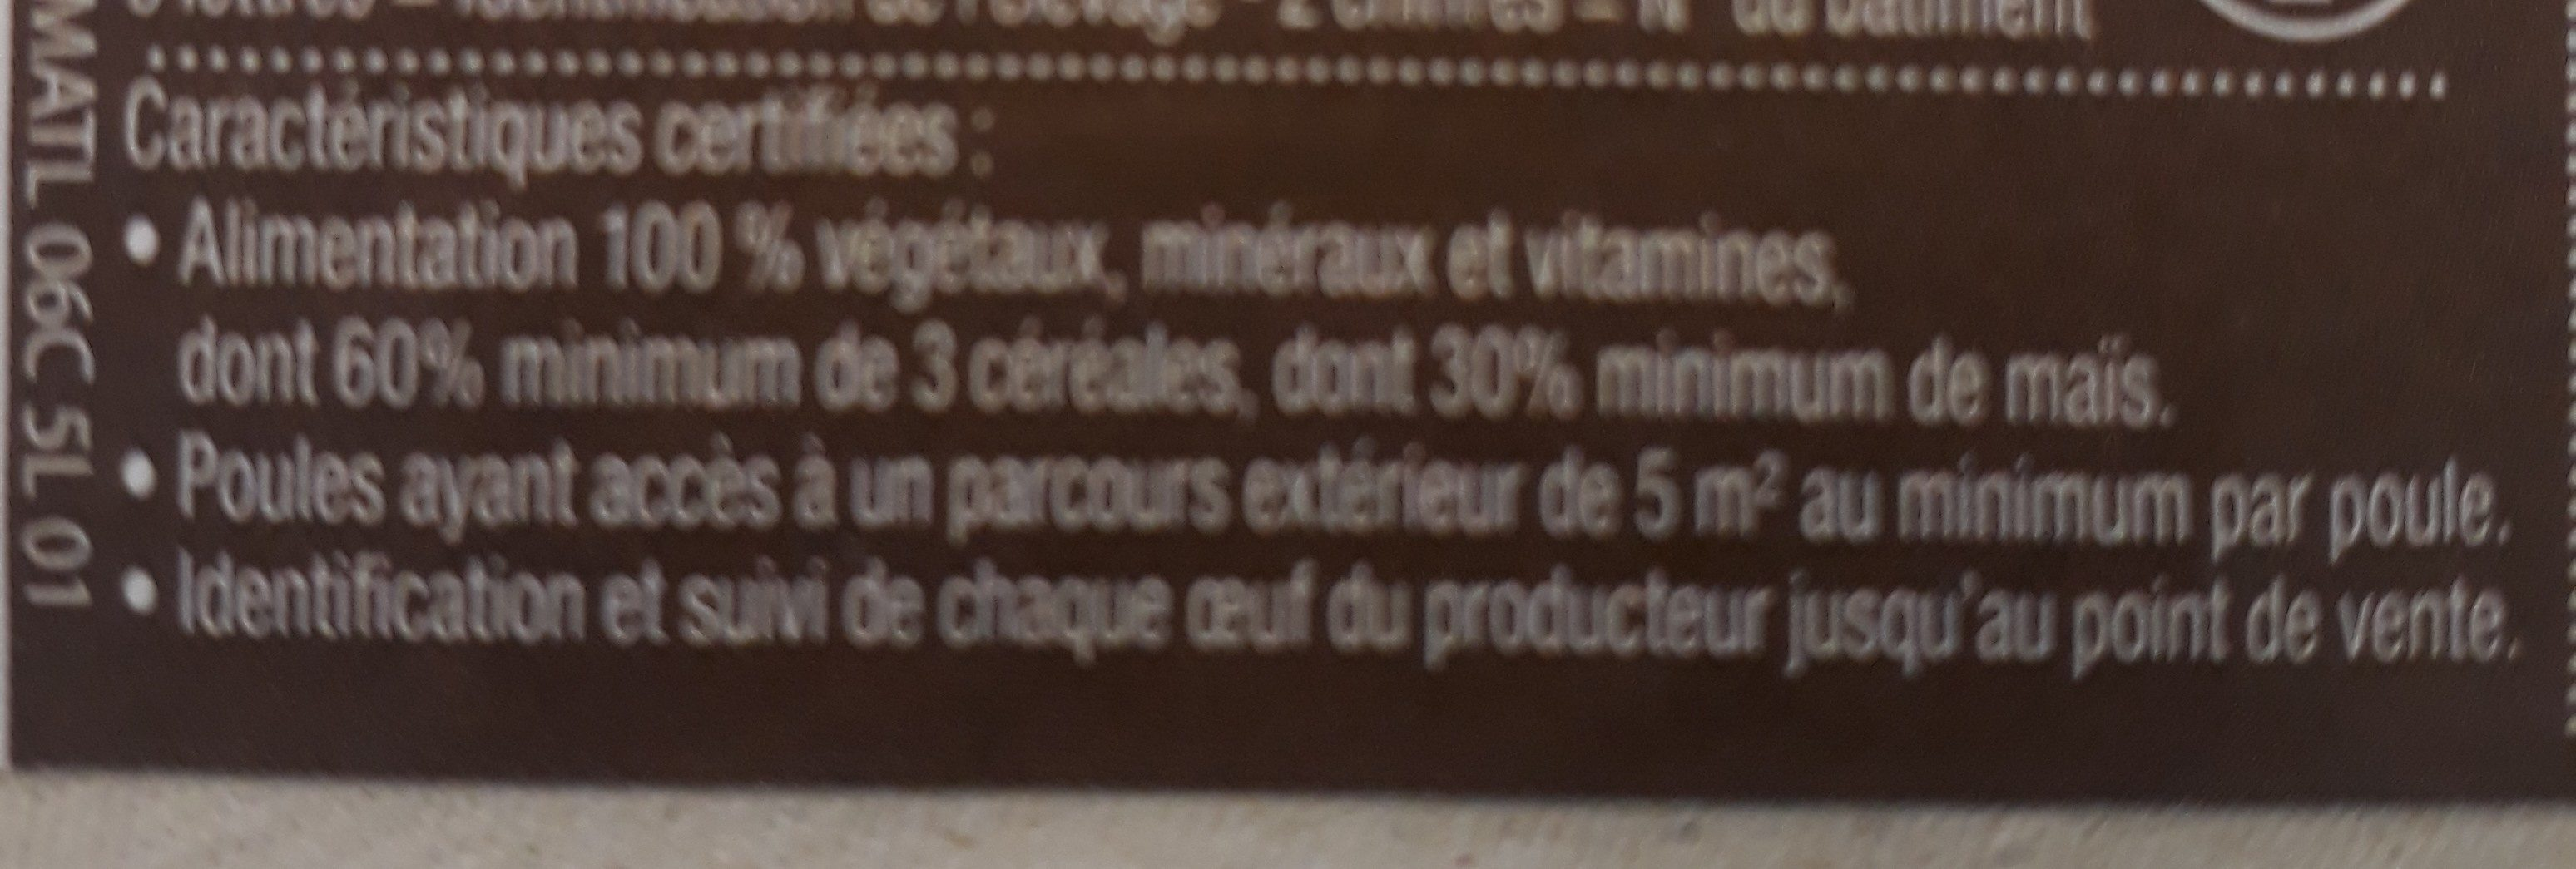 6 oeufs plein air Label Rouge gros - Ingrediënten - fr